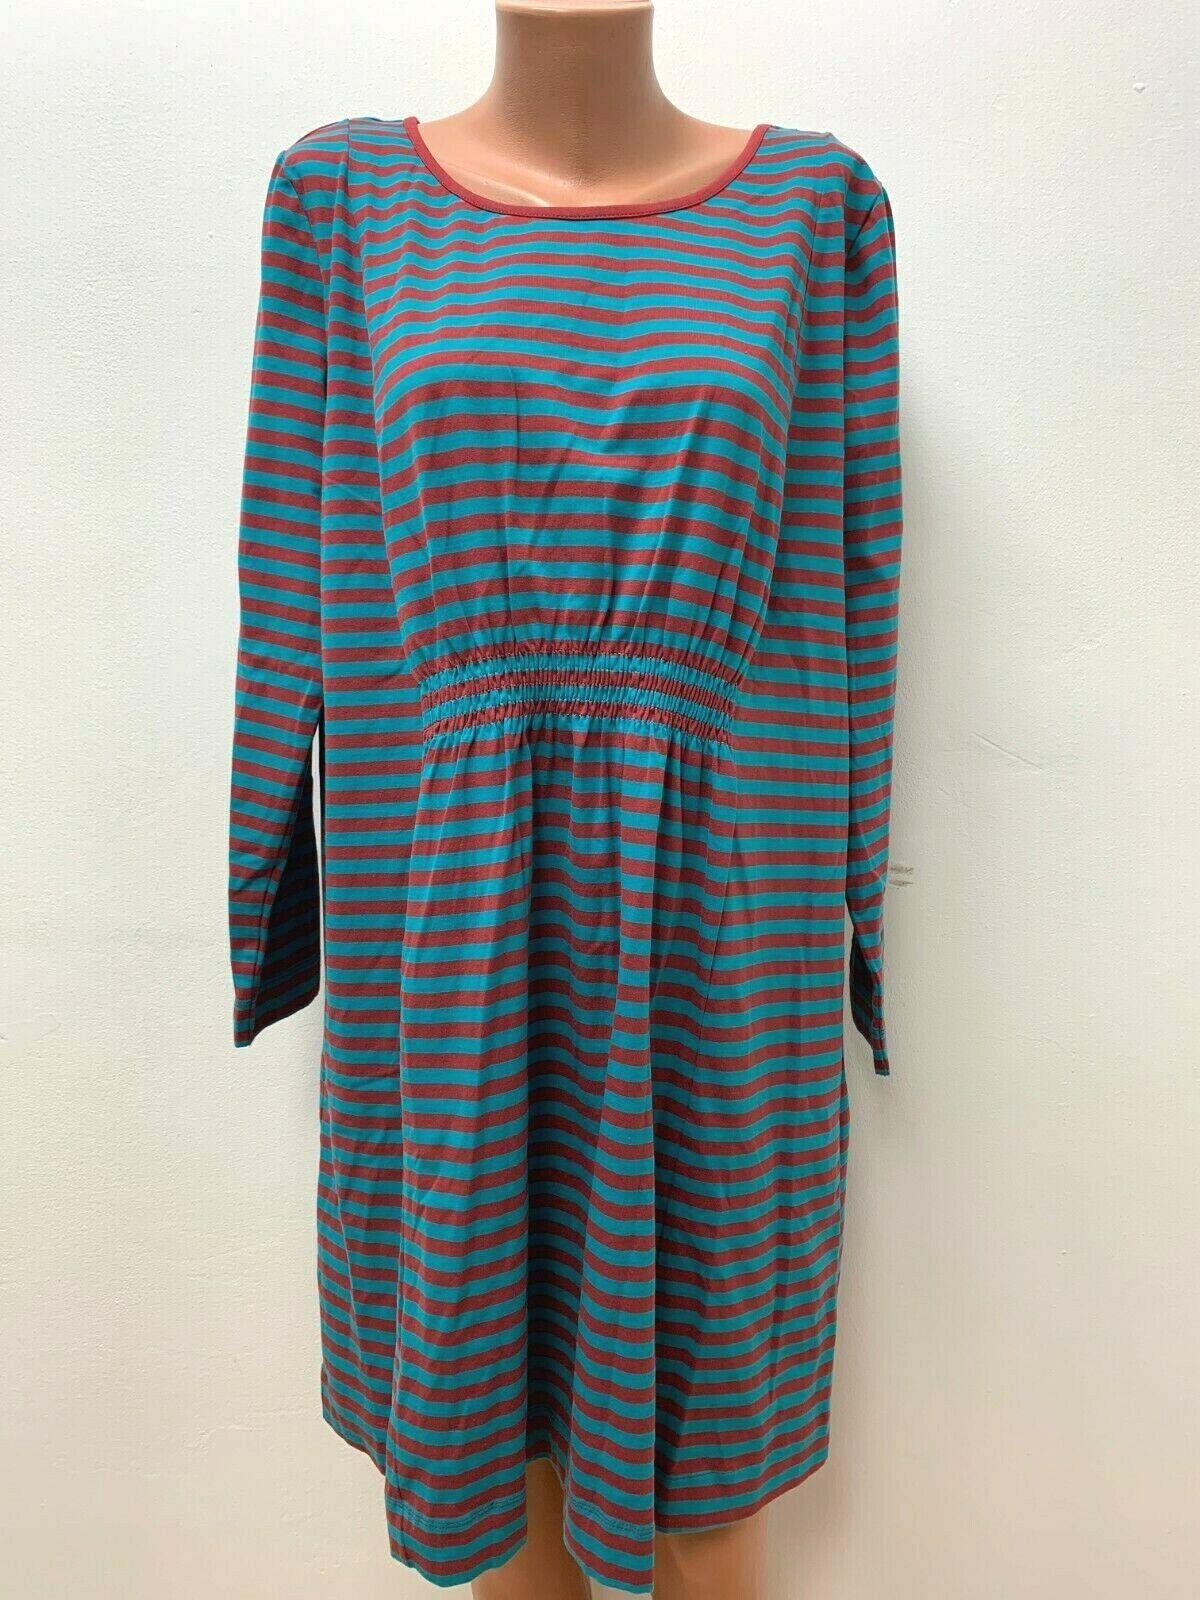 DEERBERG Gr.XL Stretch Kleid Jersey Blau Rot Gestreift langarm